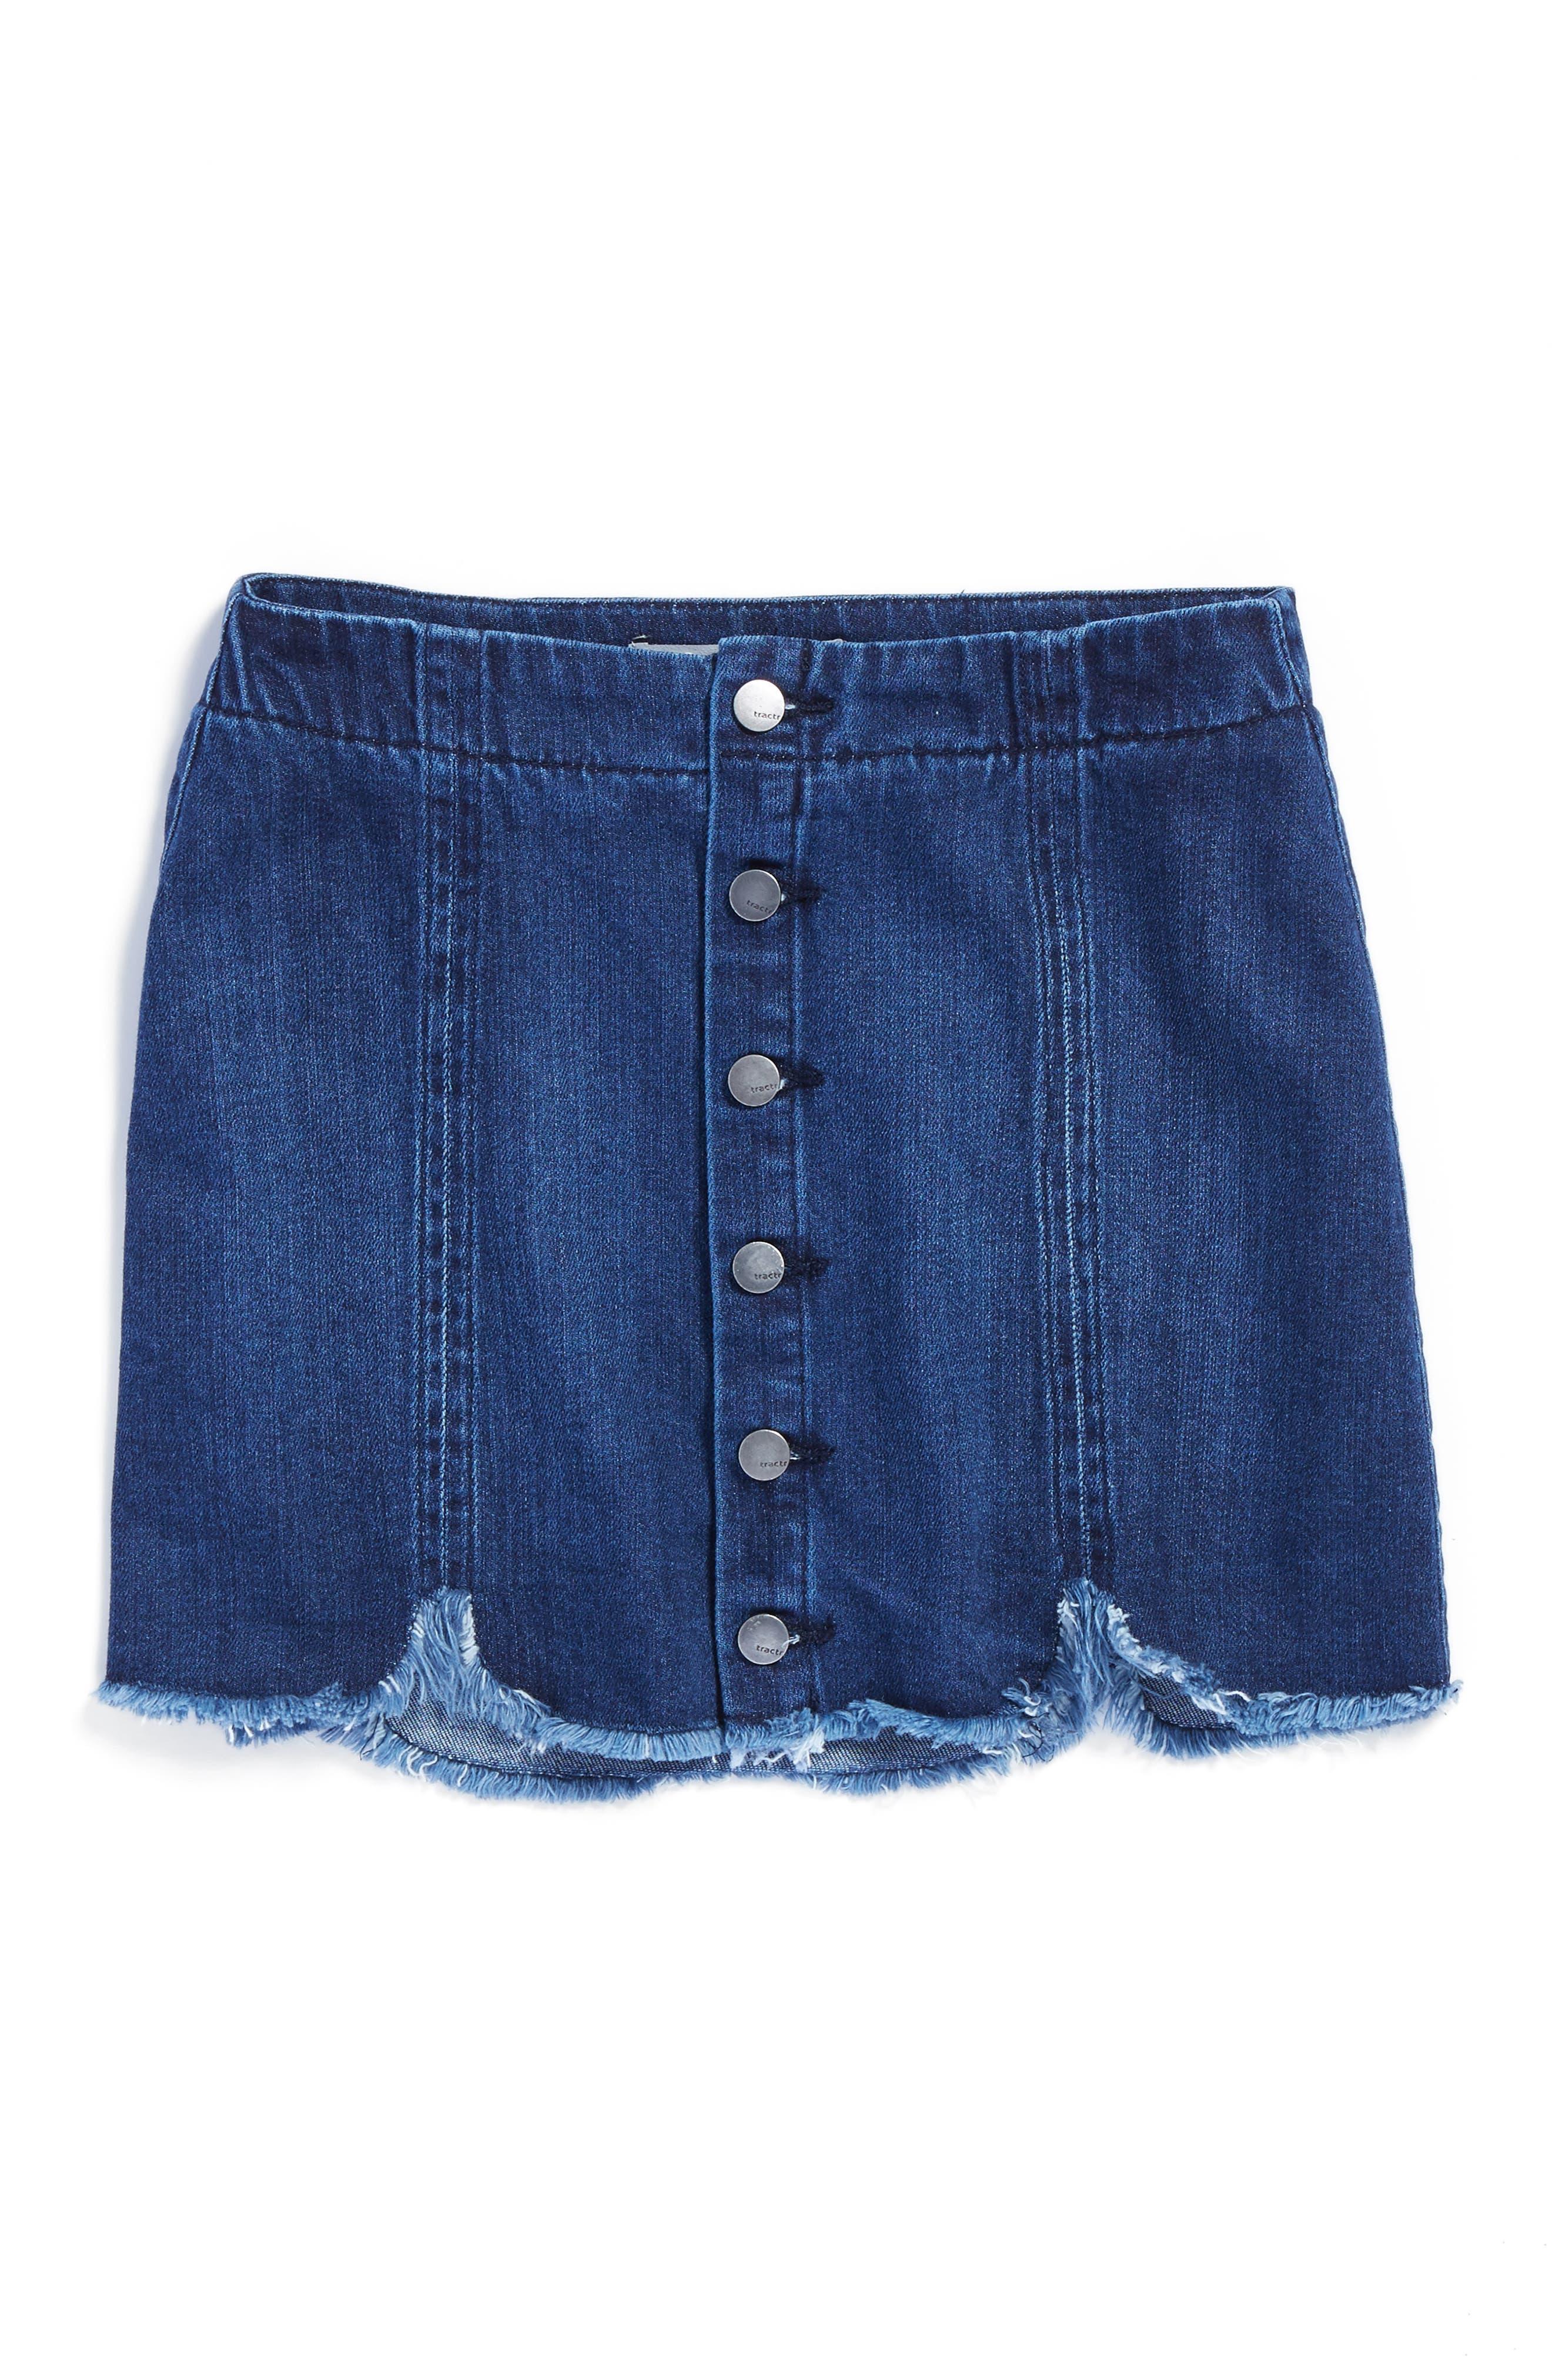 Tractr Frayed Scallop Denim Skirt (Big Girls)